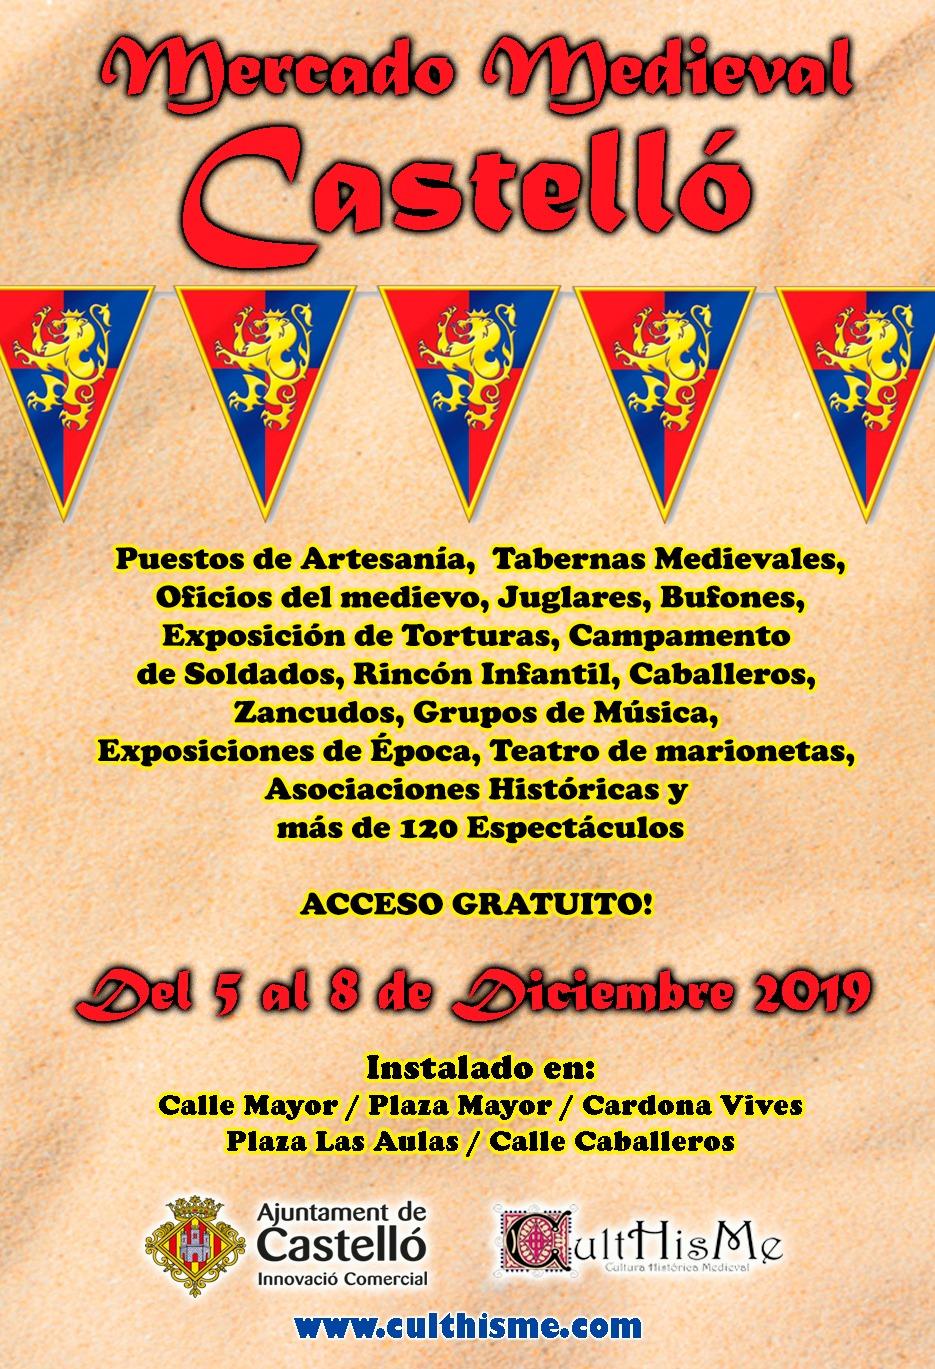 CS - Mercado medieval